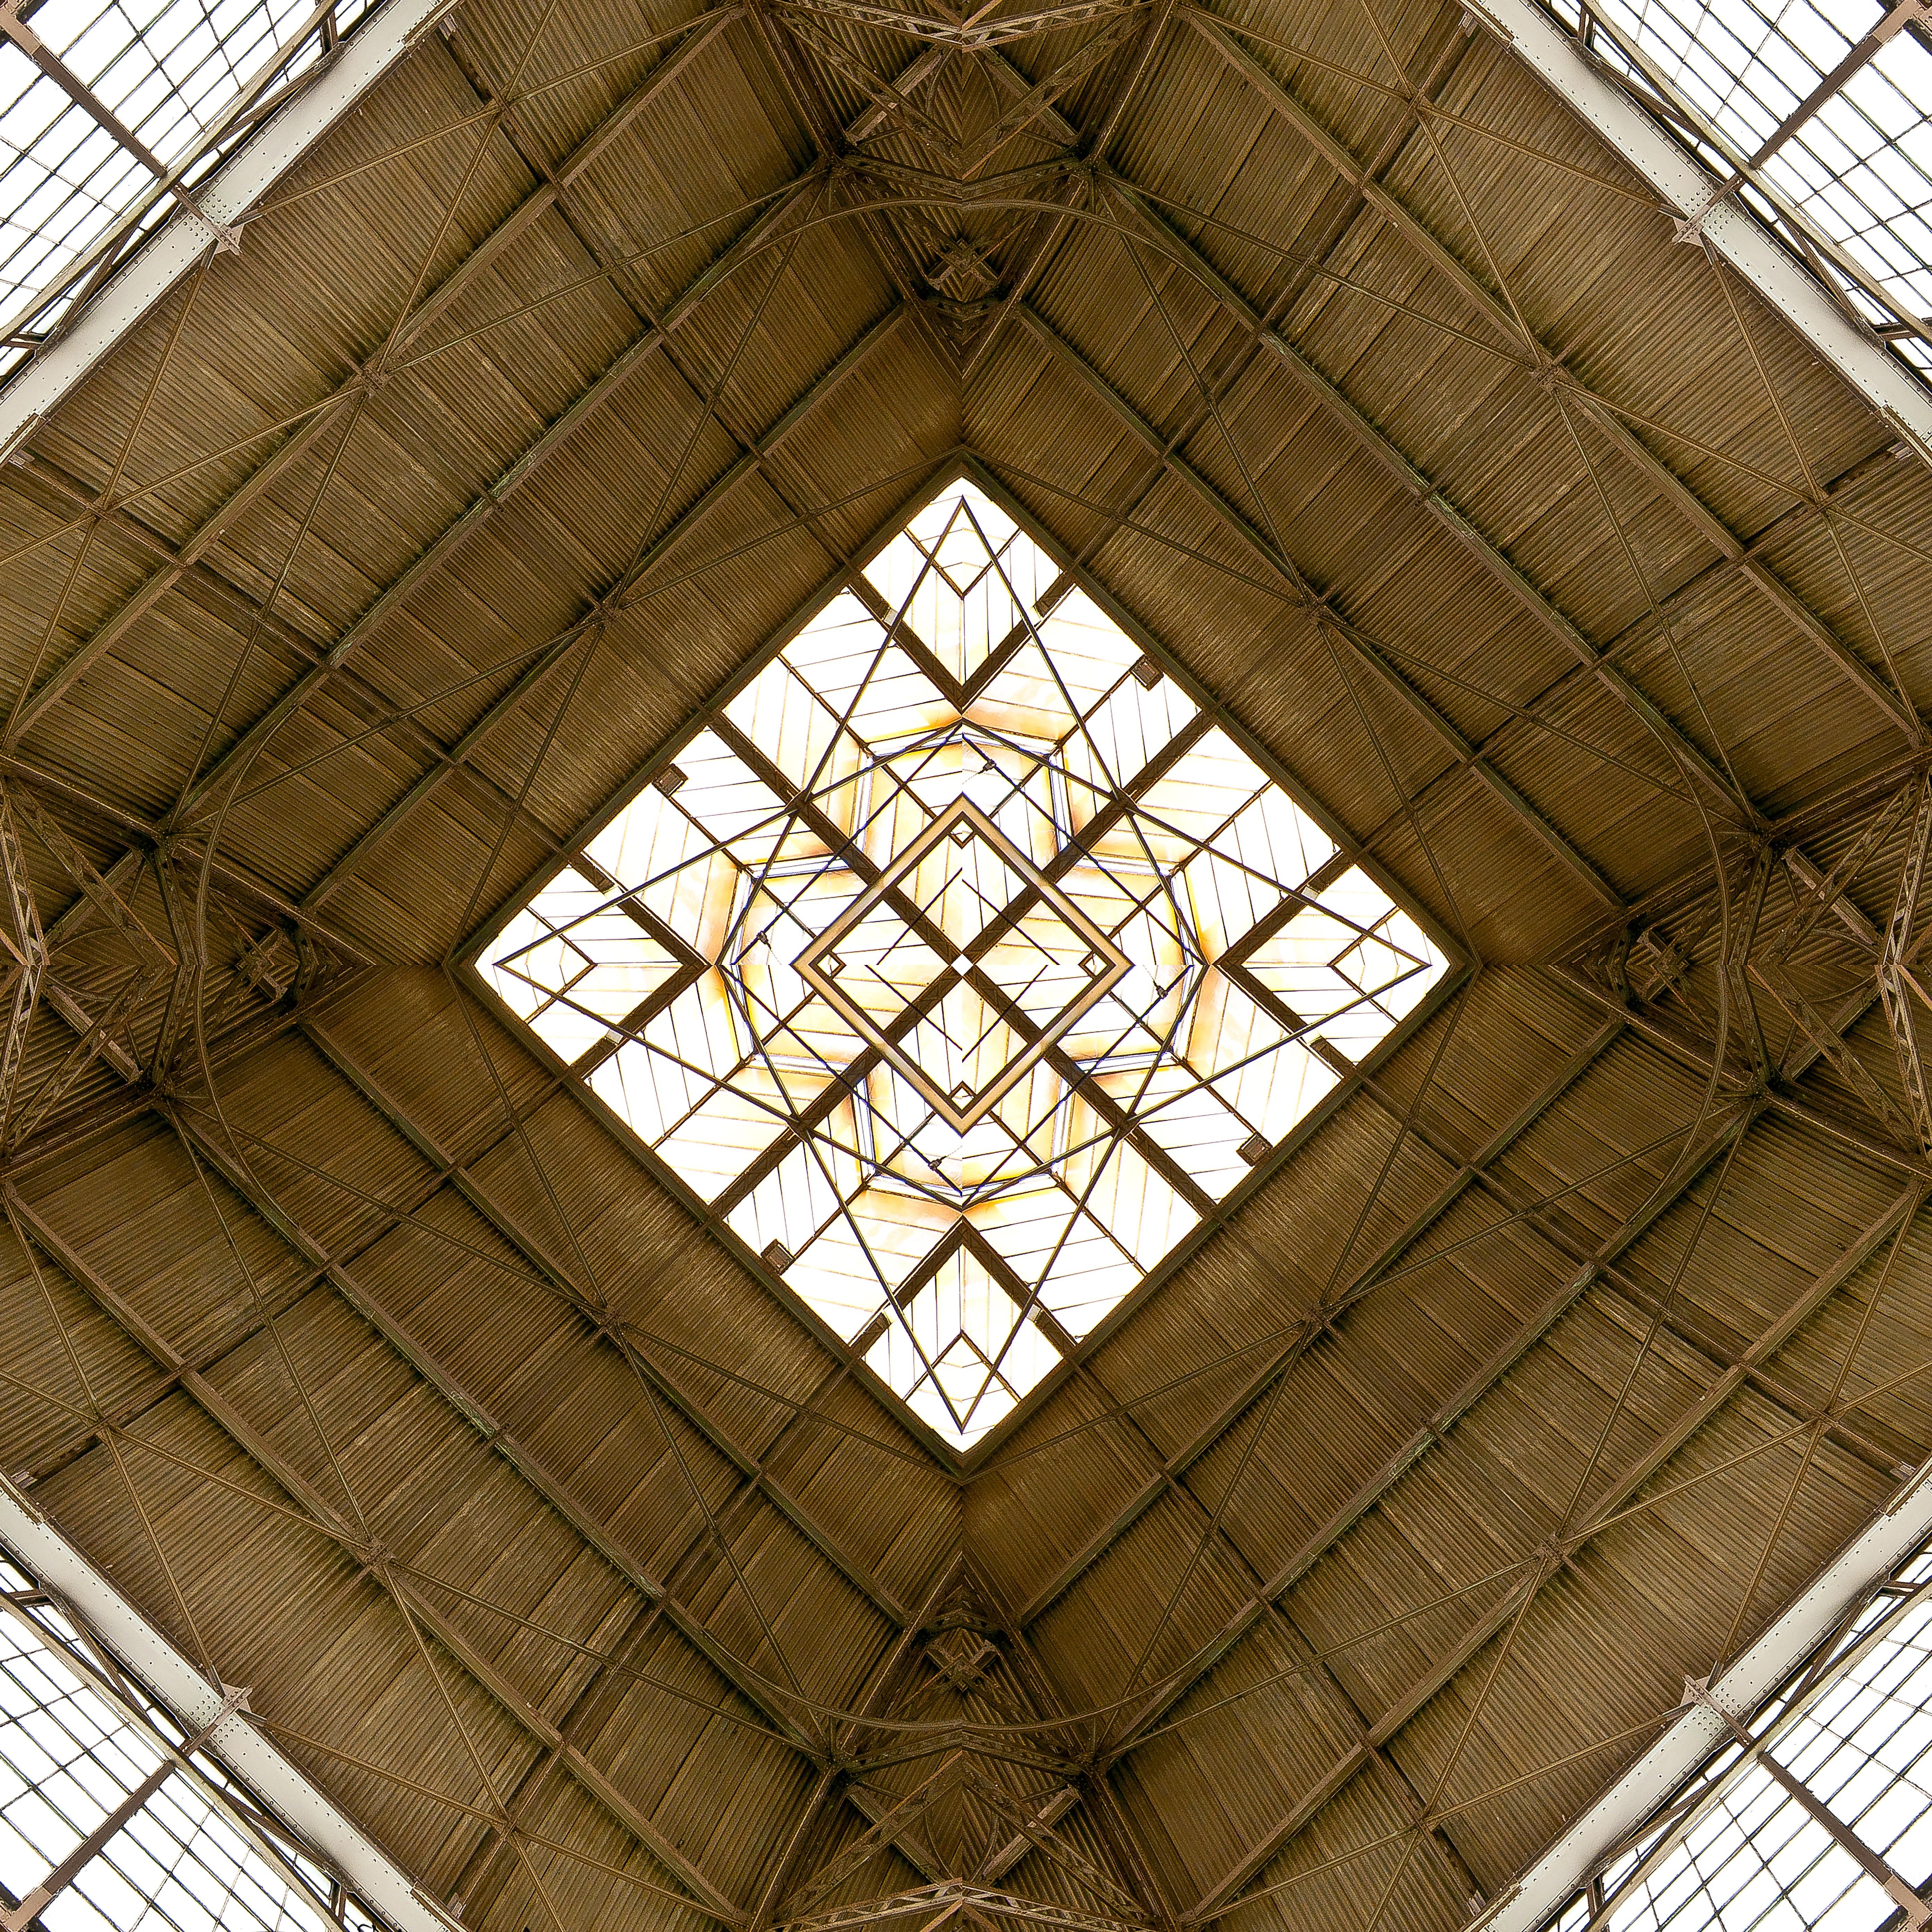 Fotos gratis : arquitectura, estructura, madera, ventana, vaso ...